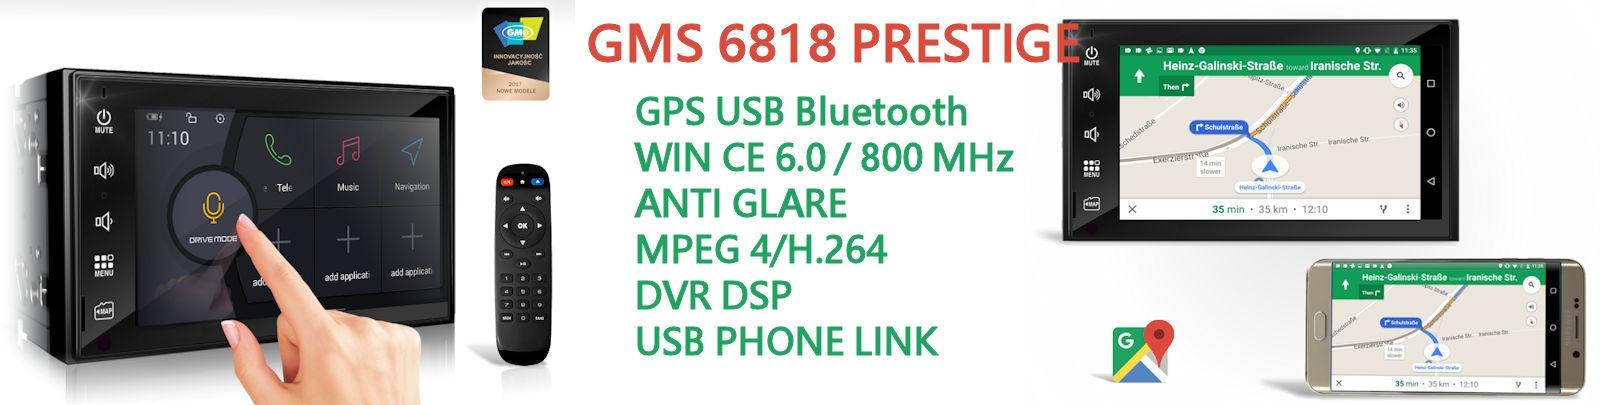 GMS 6818